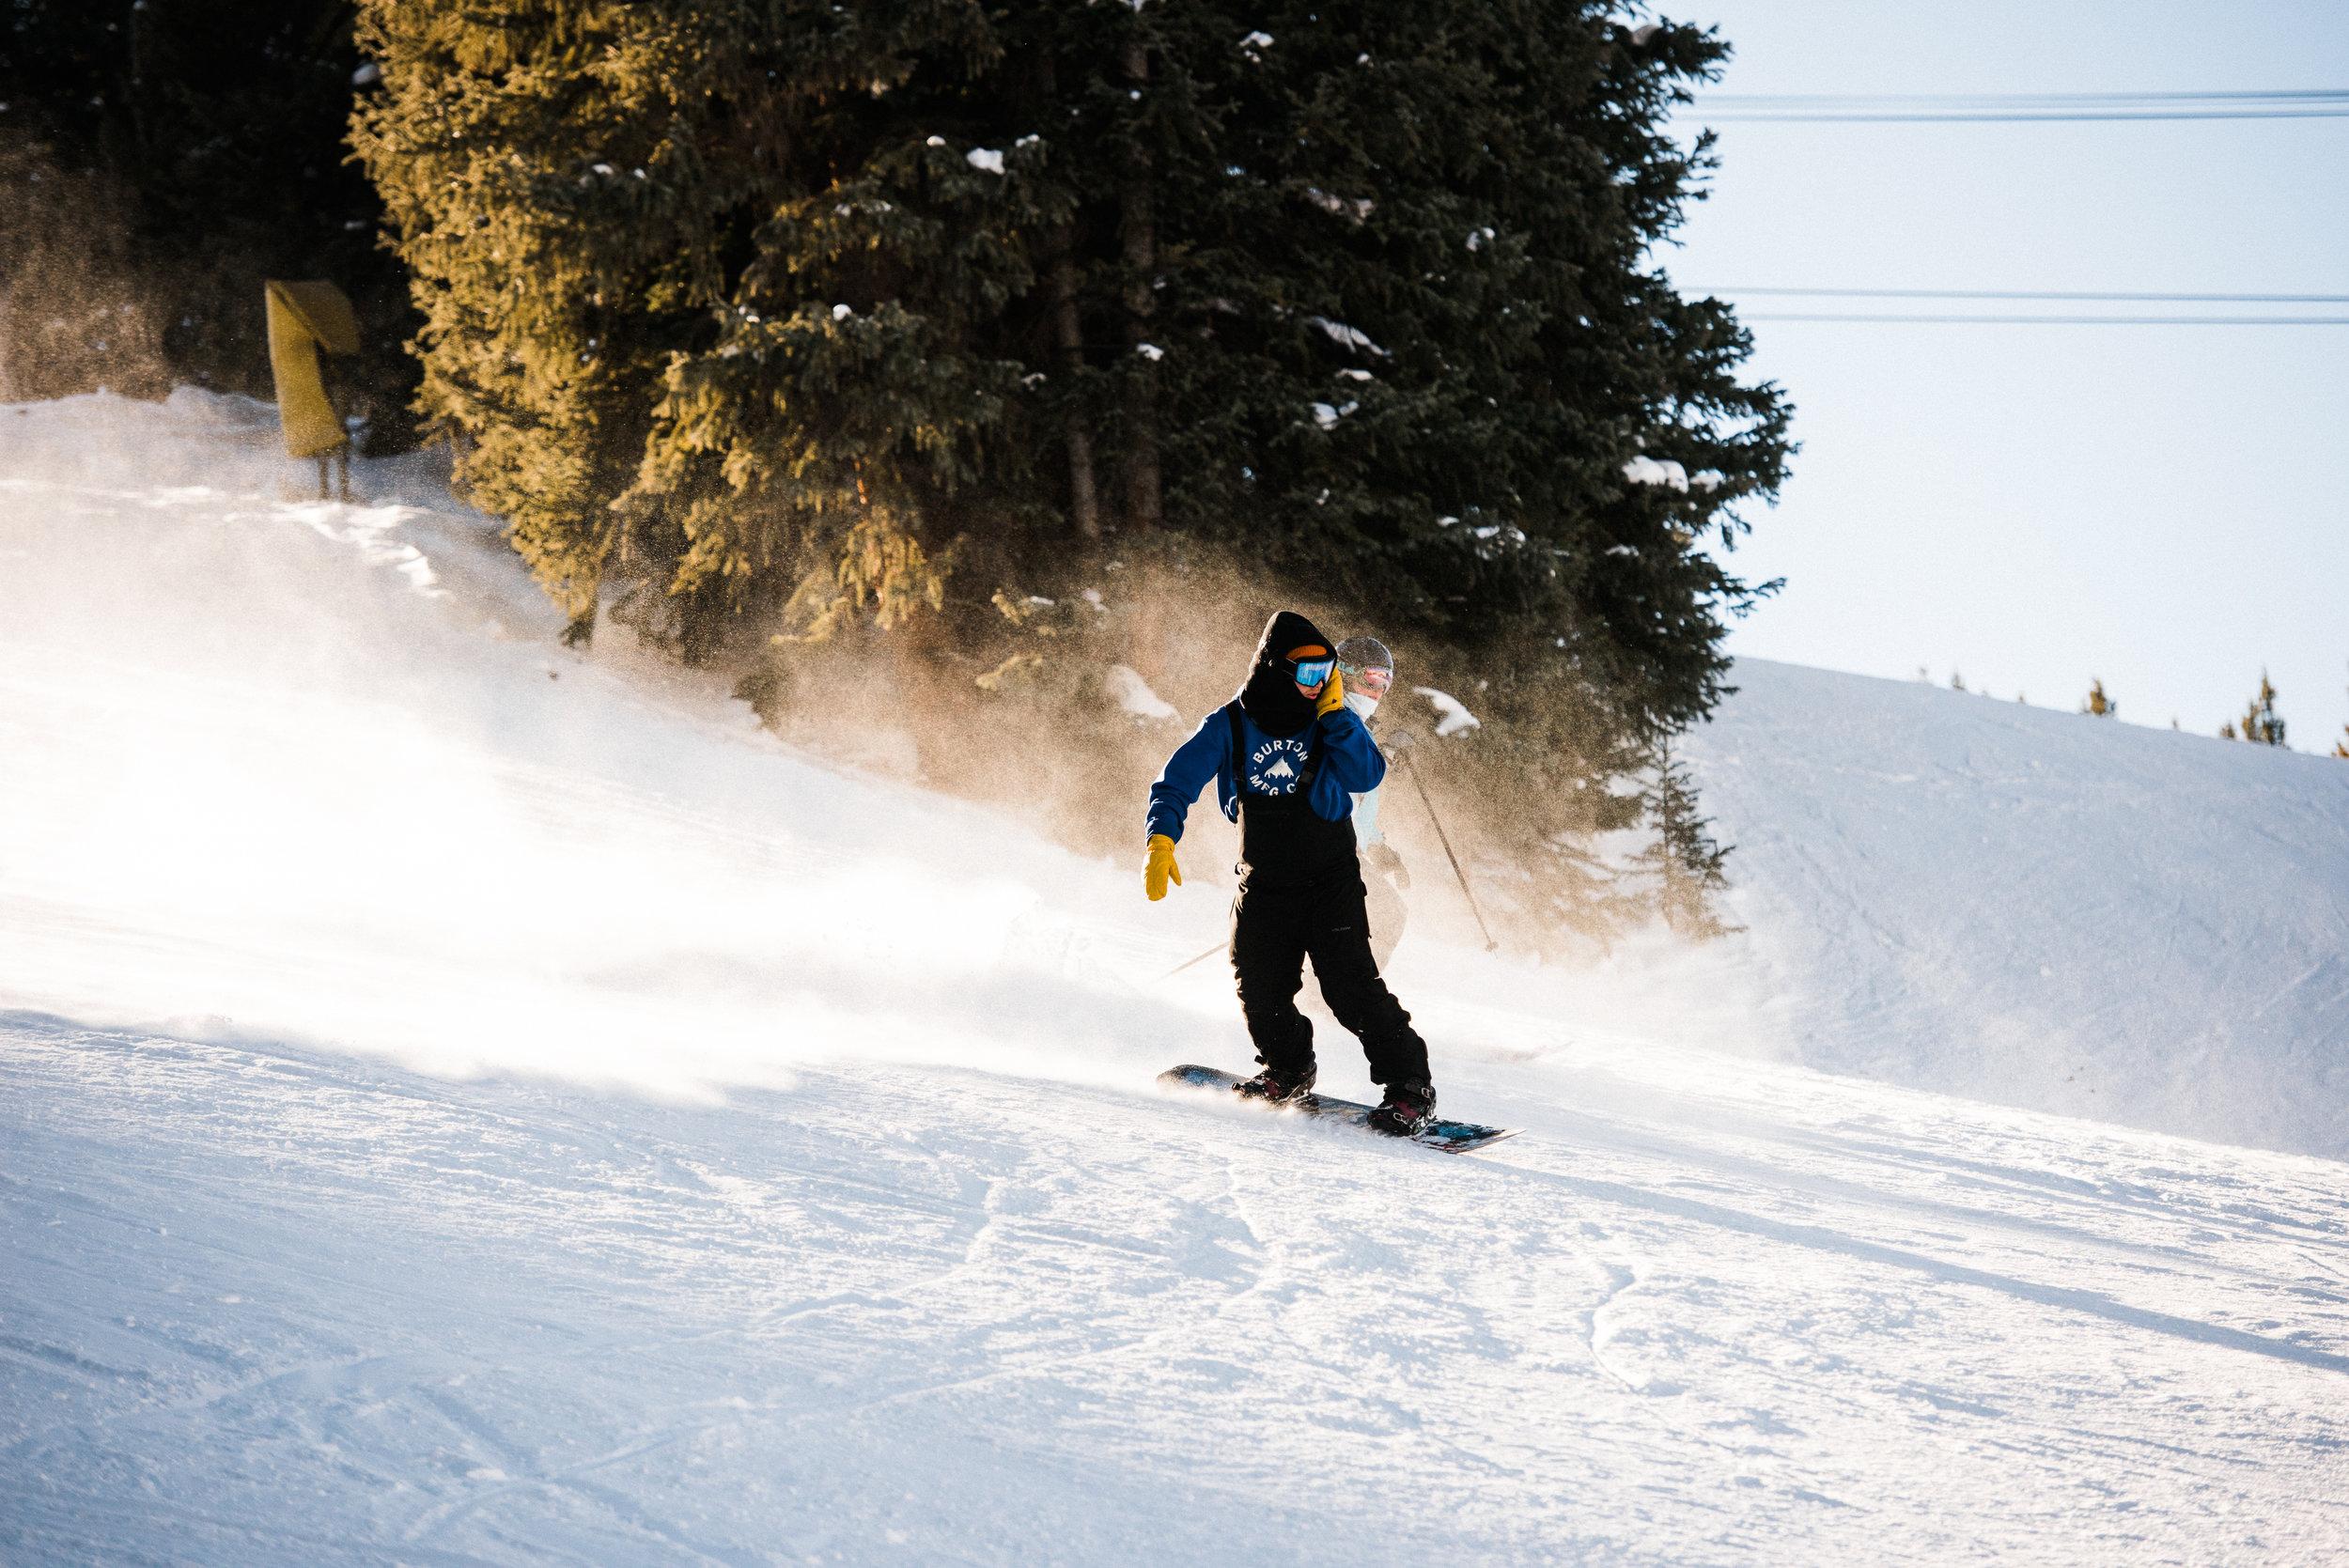 TaraShupe_Outdoor_Photographer_Loweprobags_Colorado_Copper_Mountains_Ski_56.jpg